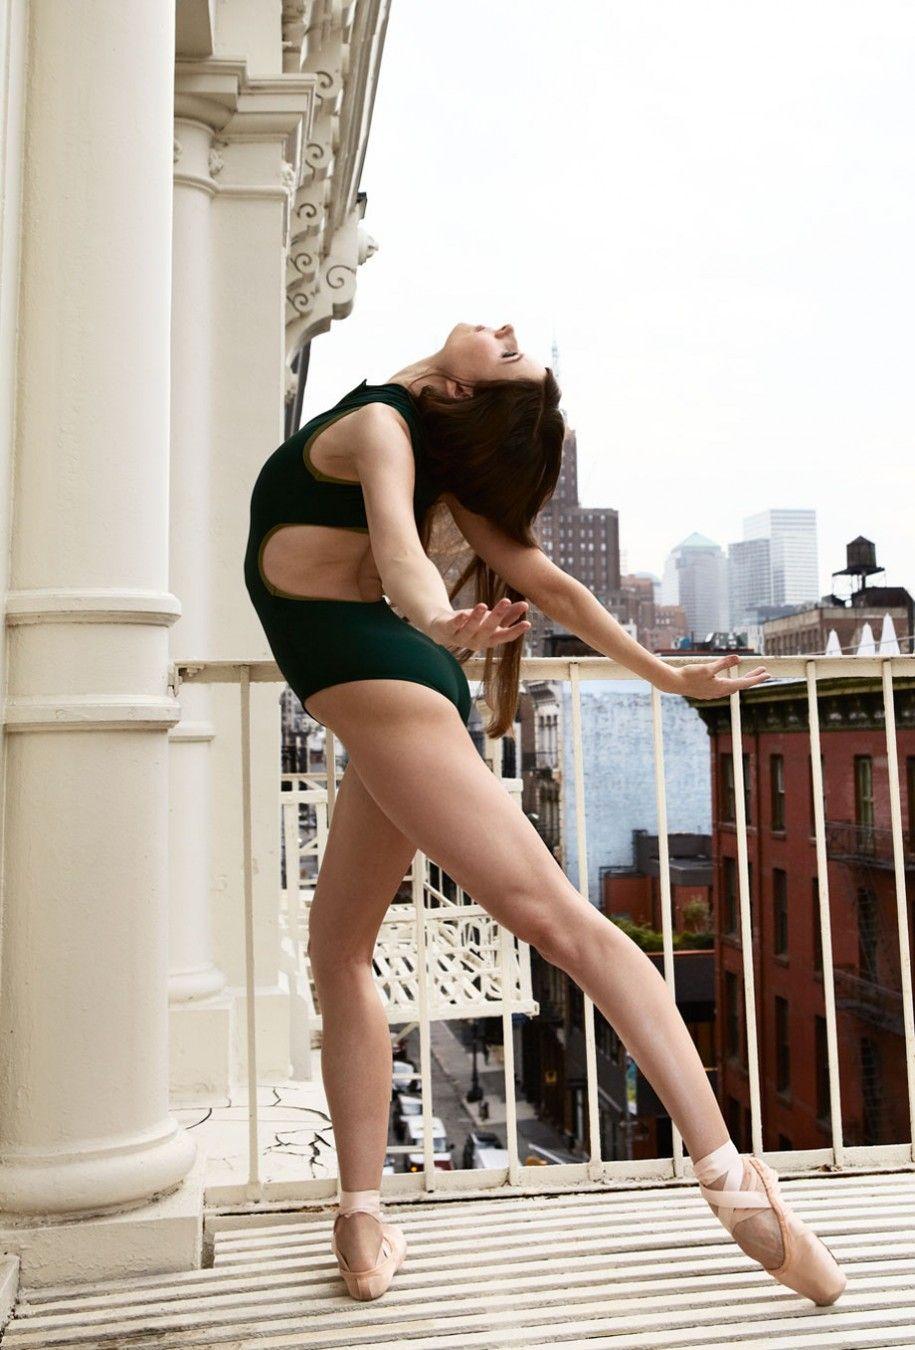 24f9ee84f07d stream ballet exercises online / Ballet Beautiful | move it | Ballet ...